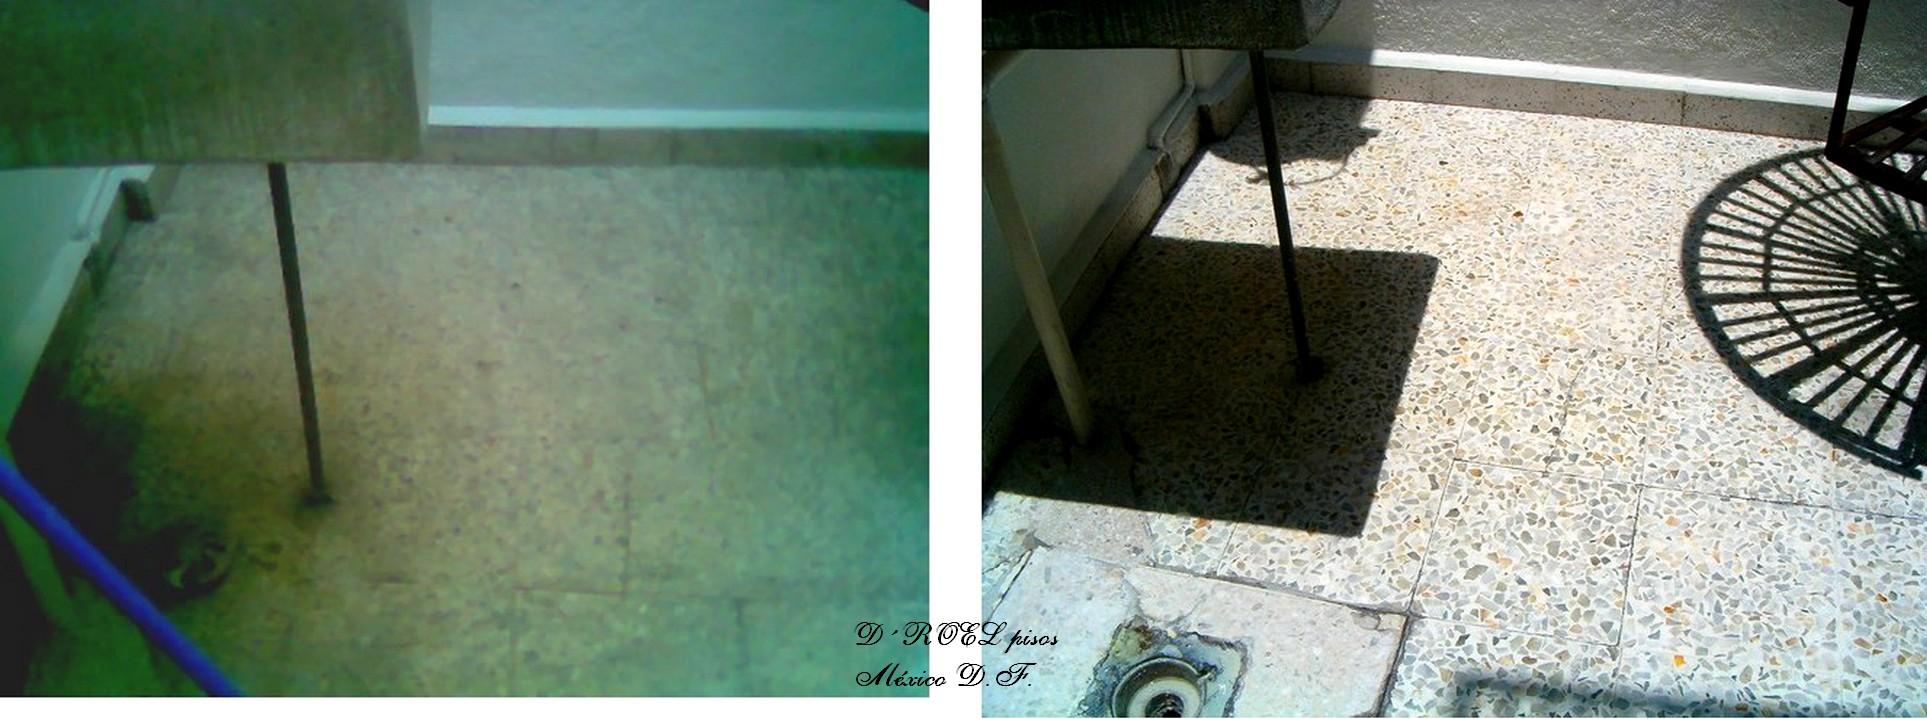 Pulido de pisos de granito vbf for Pulido de pisos de granito